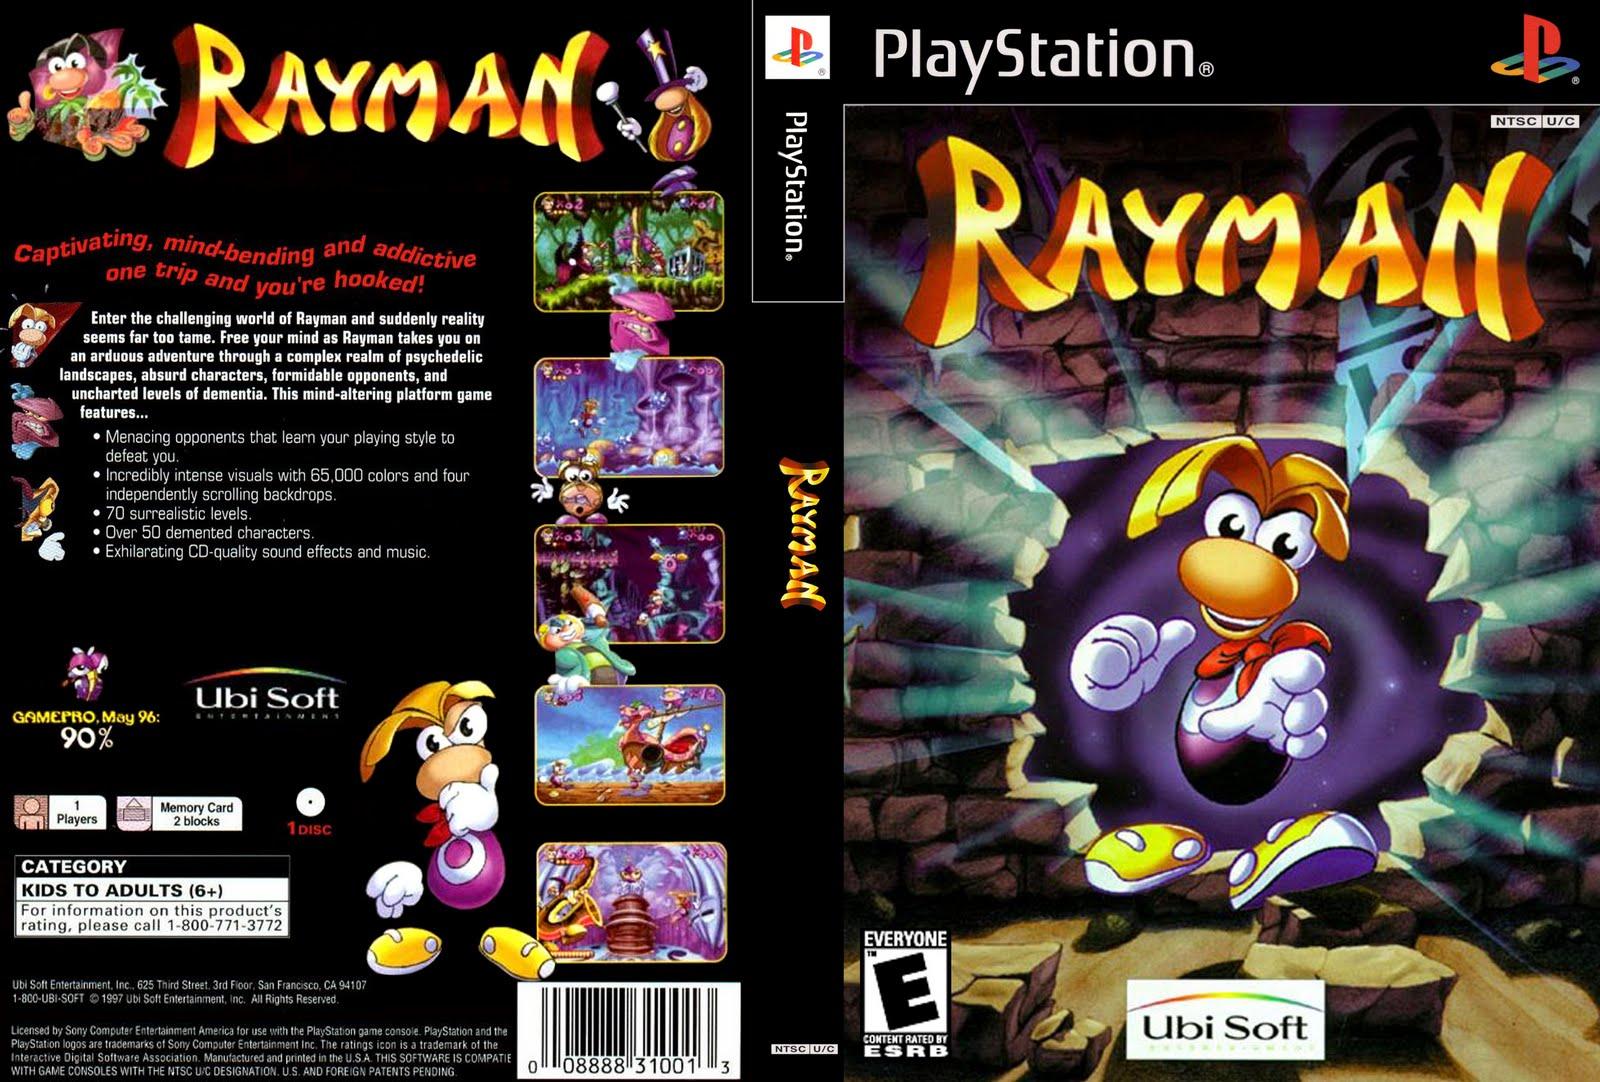 Rayman+%28ps%29.jpg